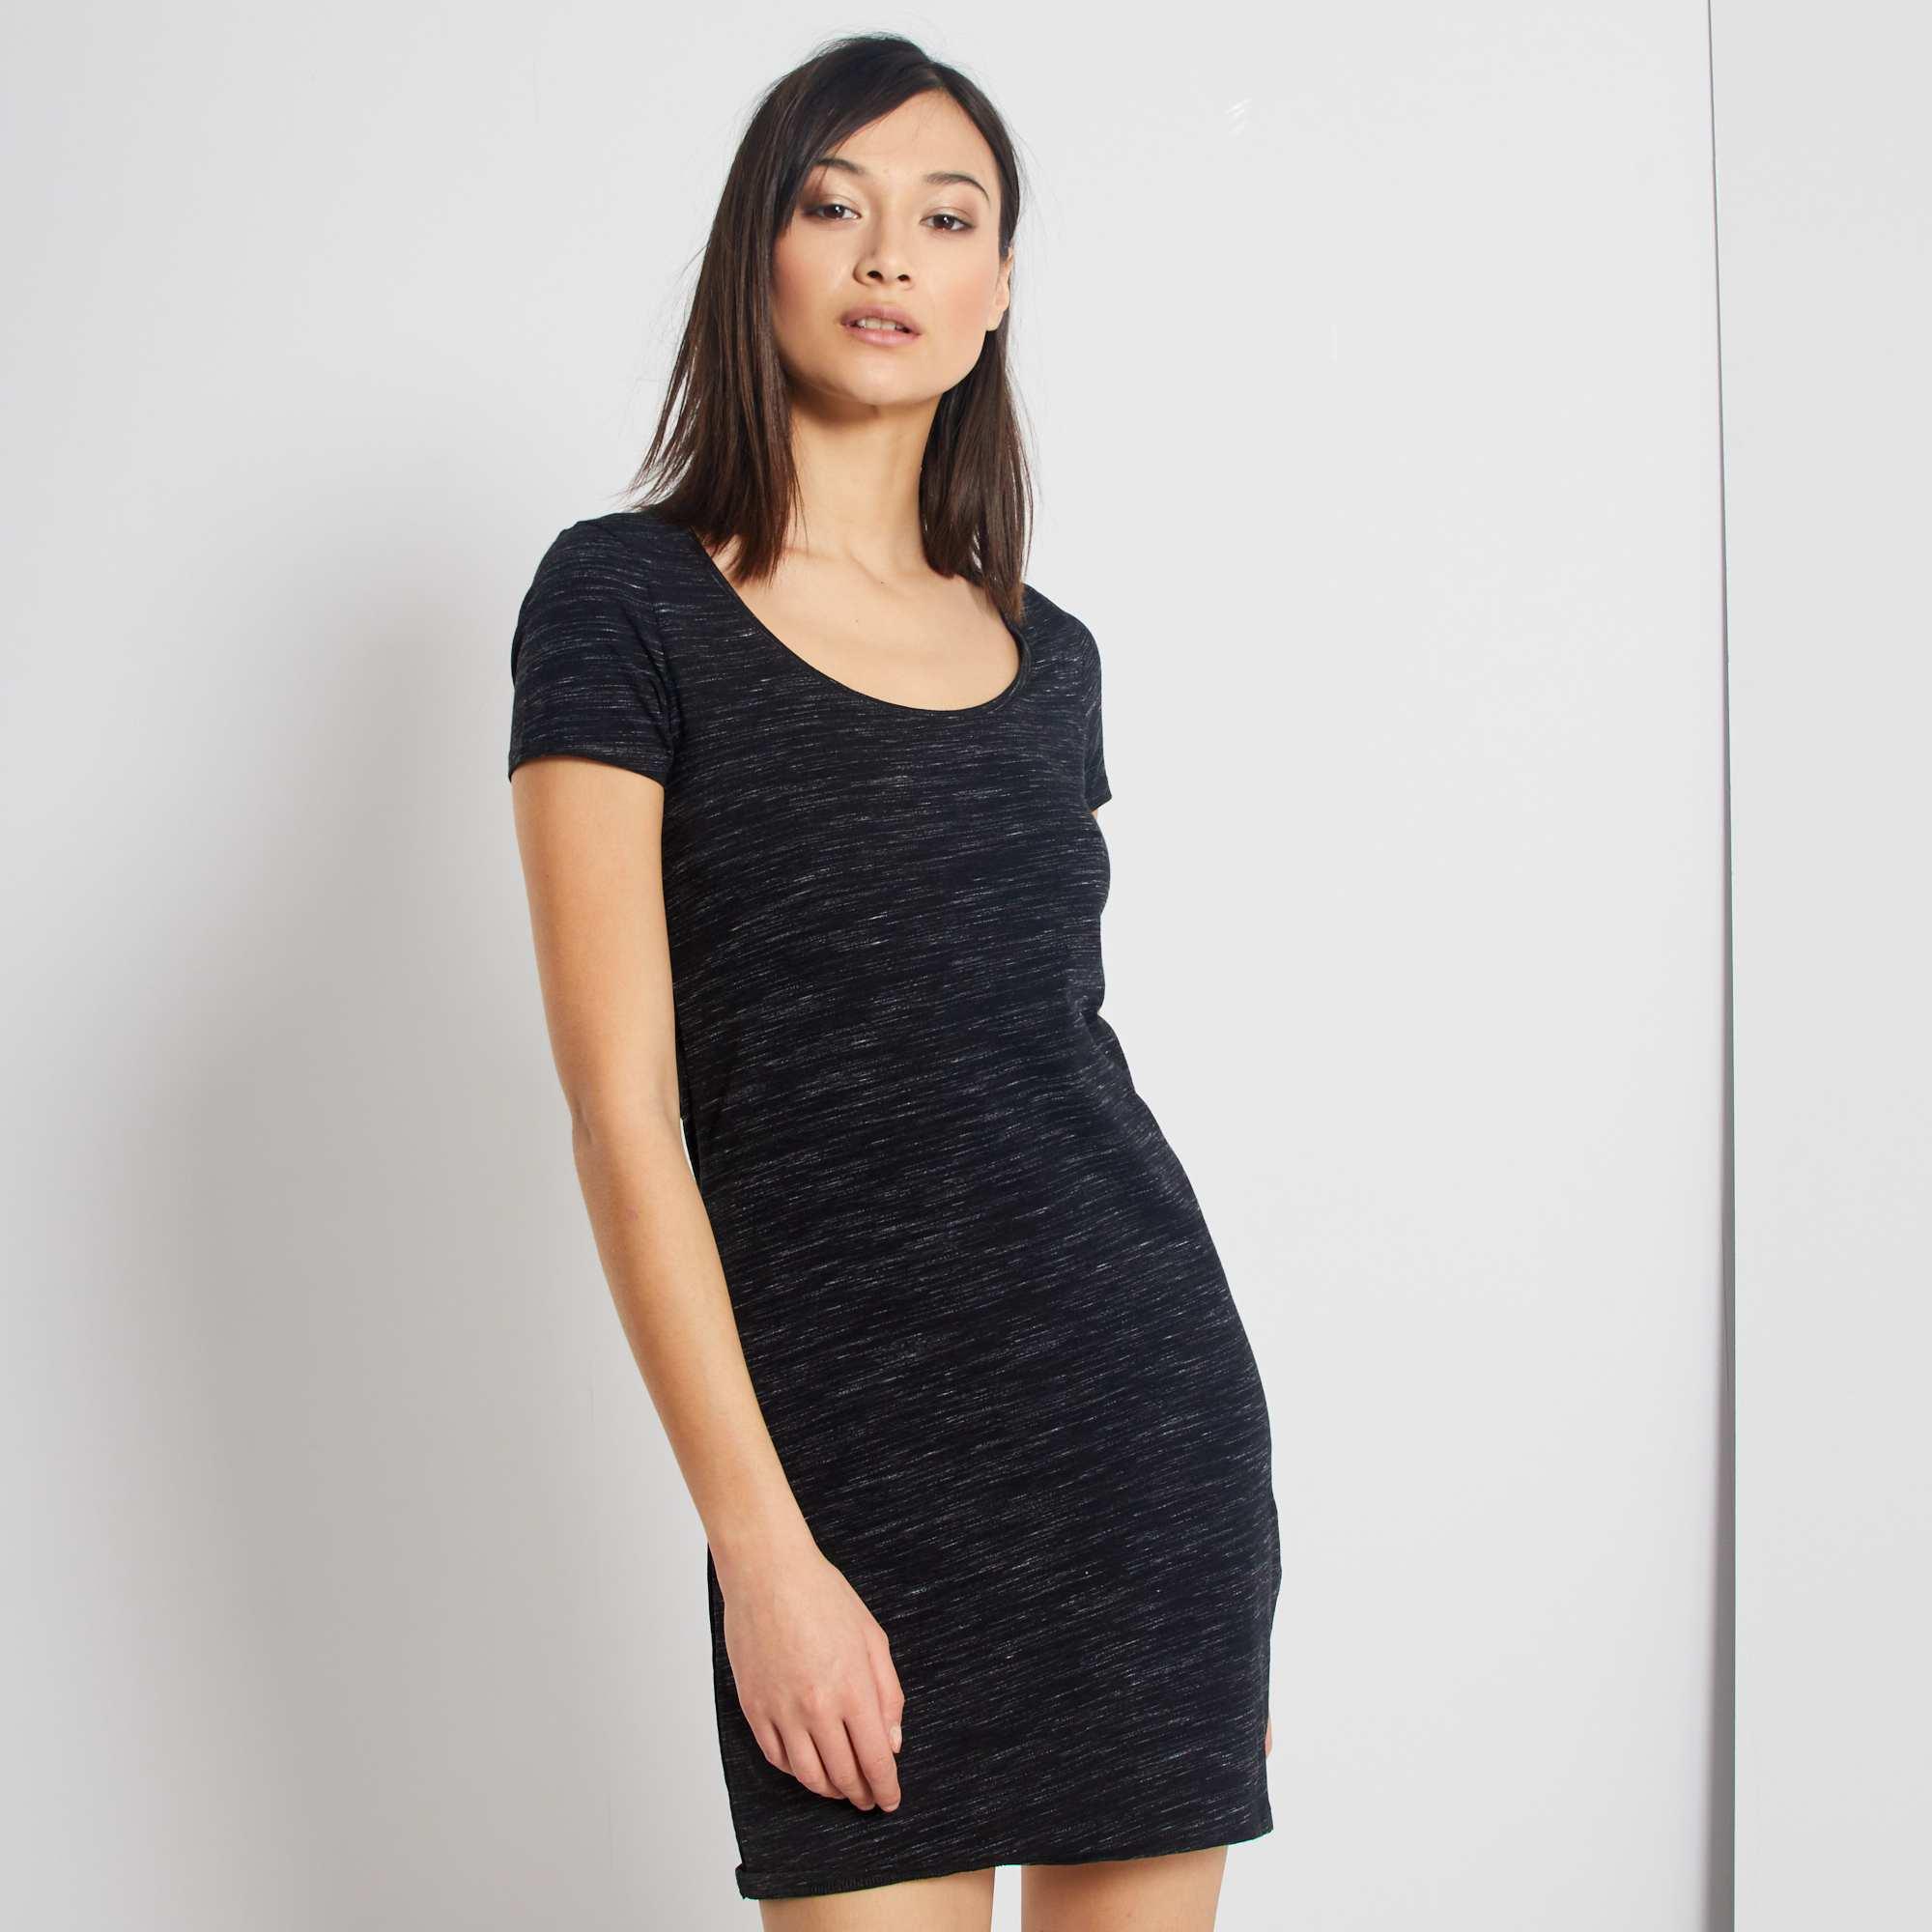 8253da1d8ca Robe tee-shirt Femme - gris anthracite - Kiabi - 8